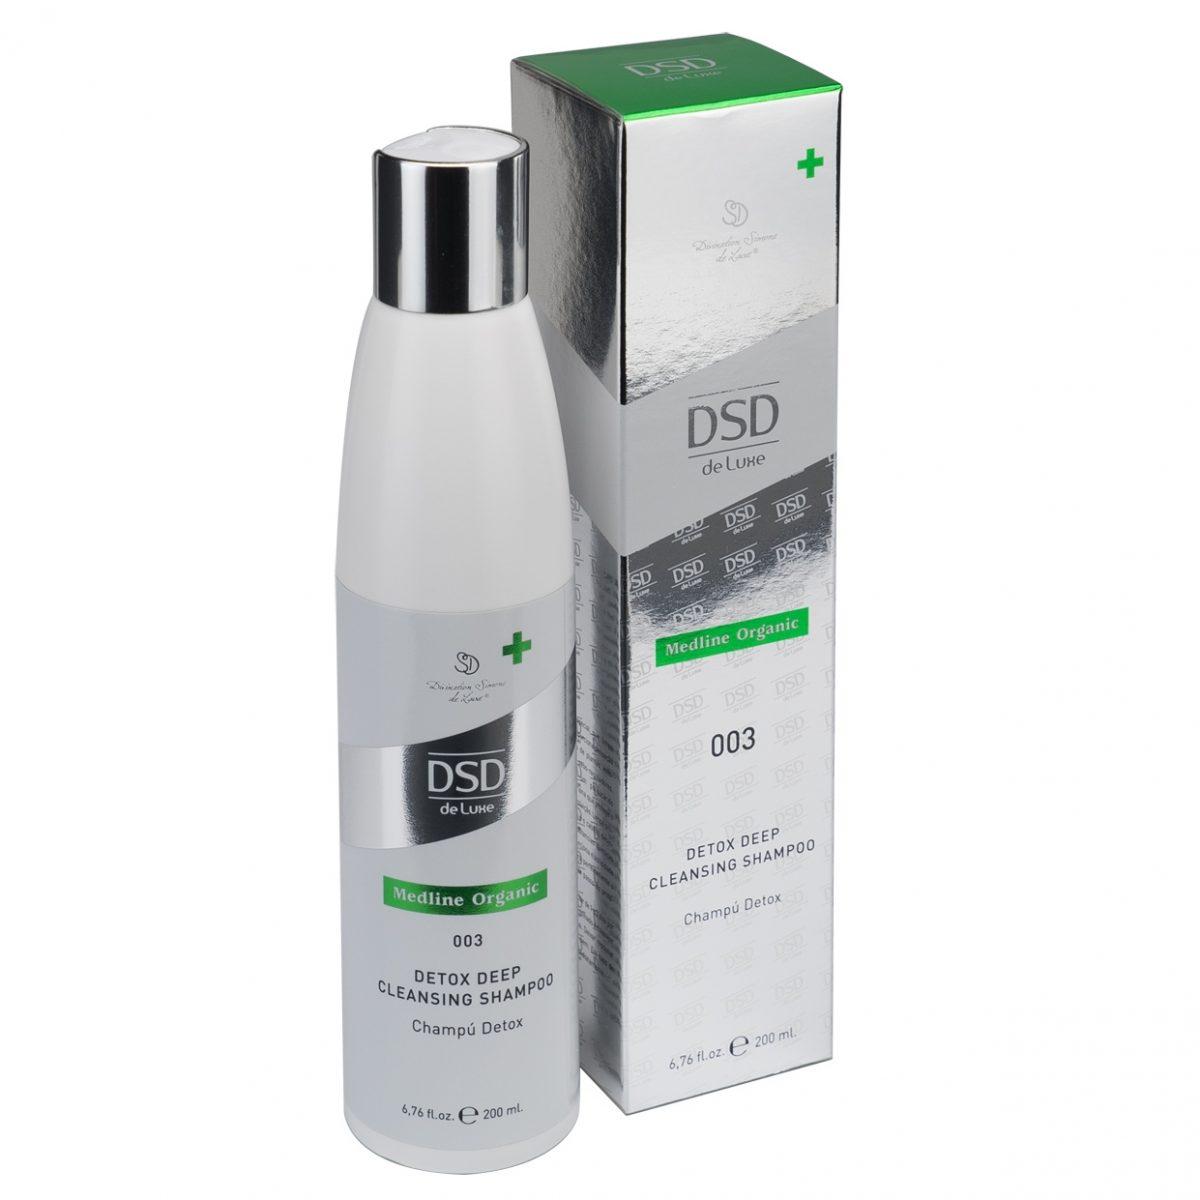 DSD DE LUXE 003 Detox deep cleansing shampoo